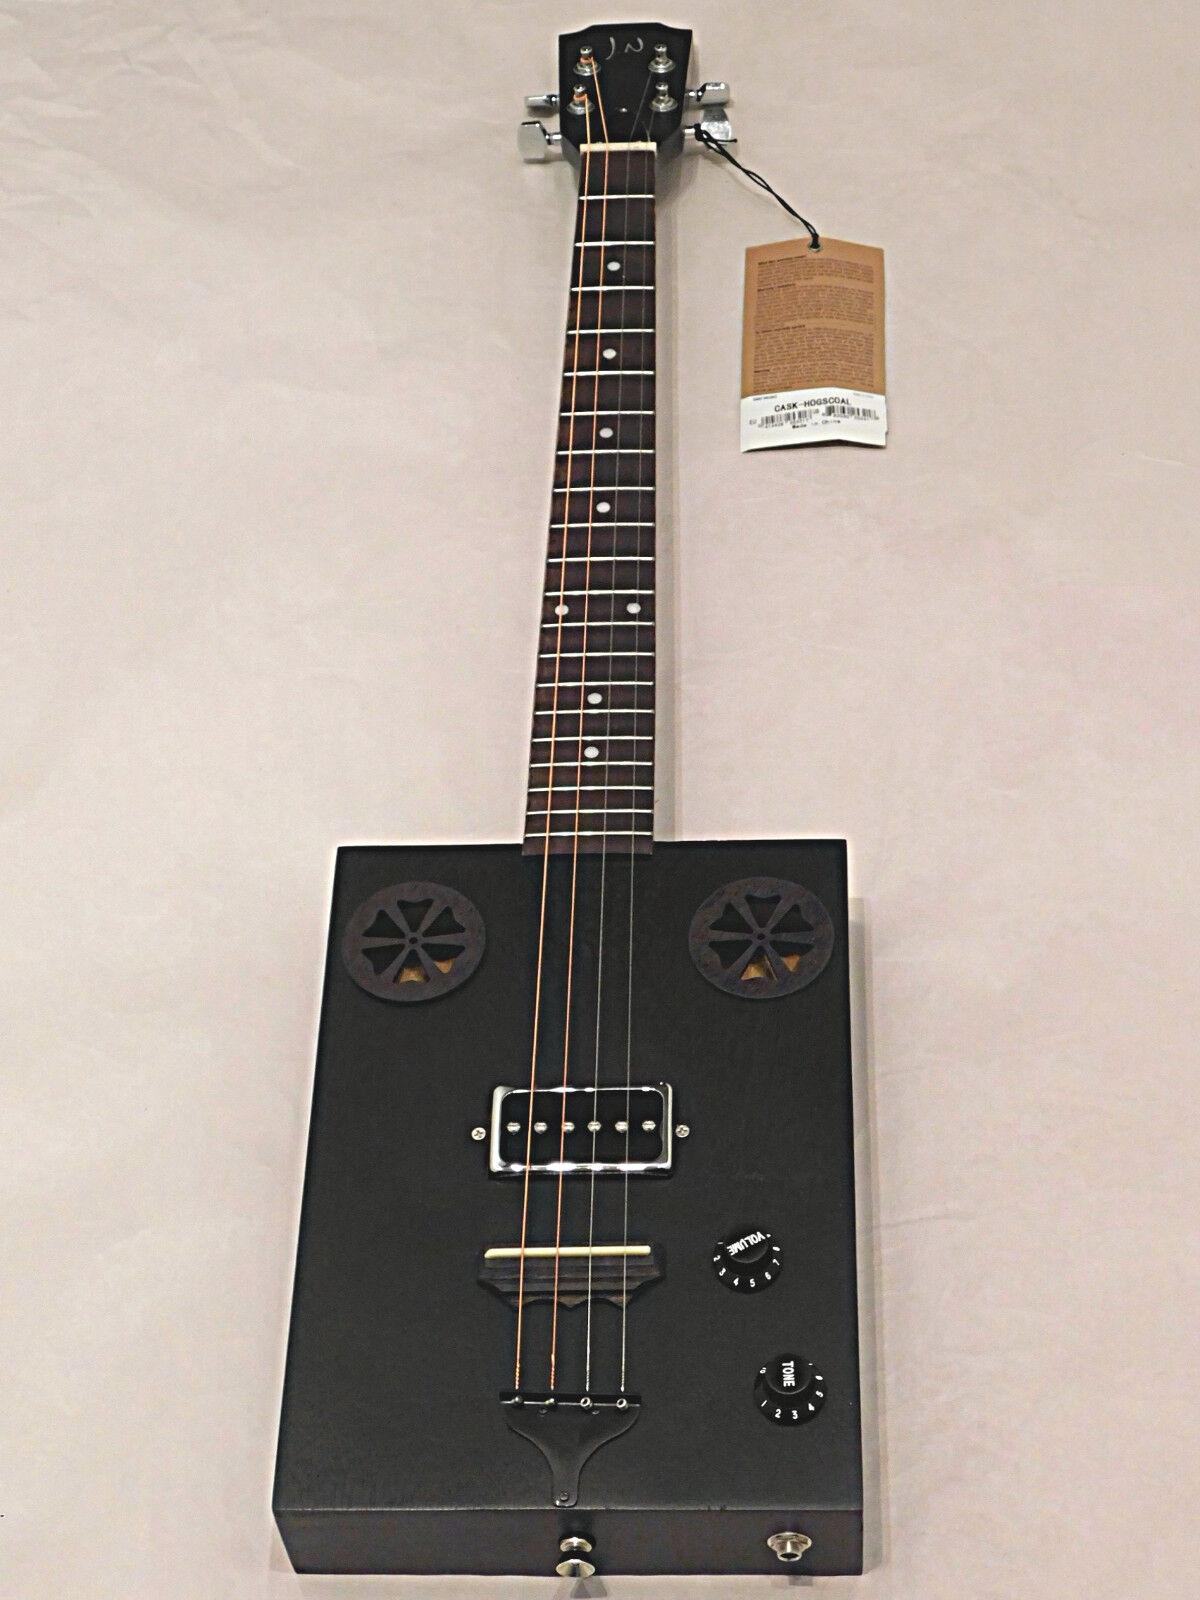 James Neligan CASK HogsCoal 4 string Acoustic Electric p-90 Cigar Box Guitar BLK